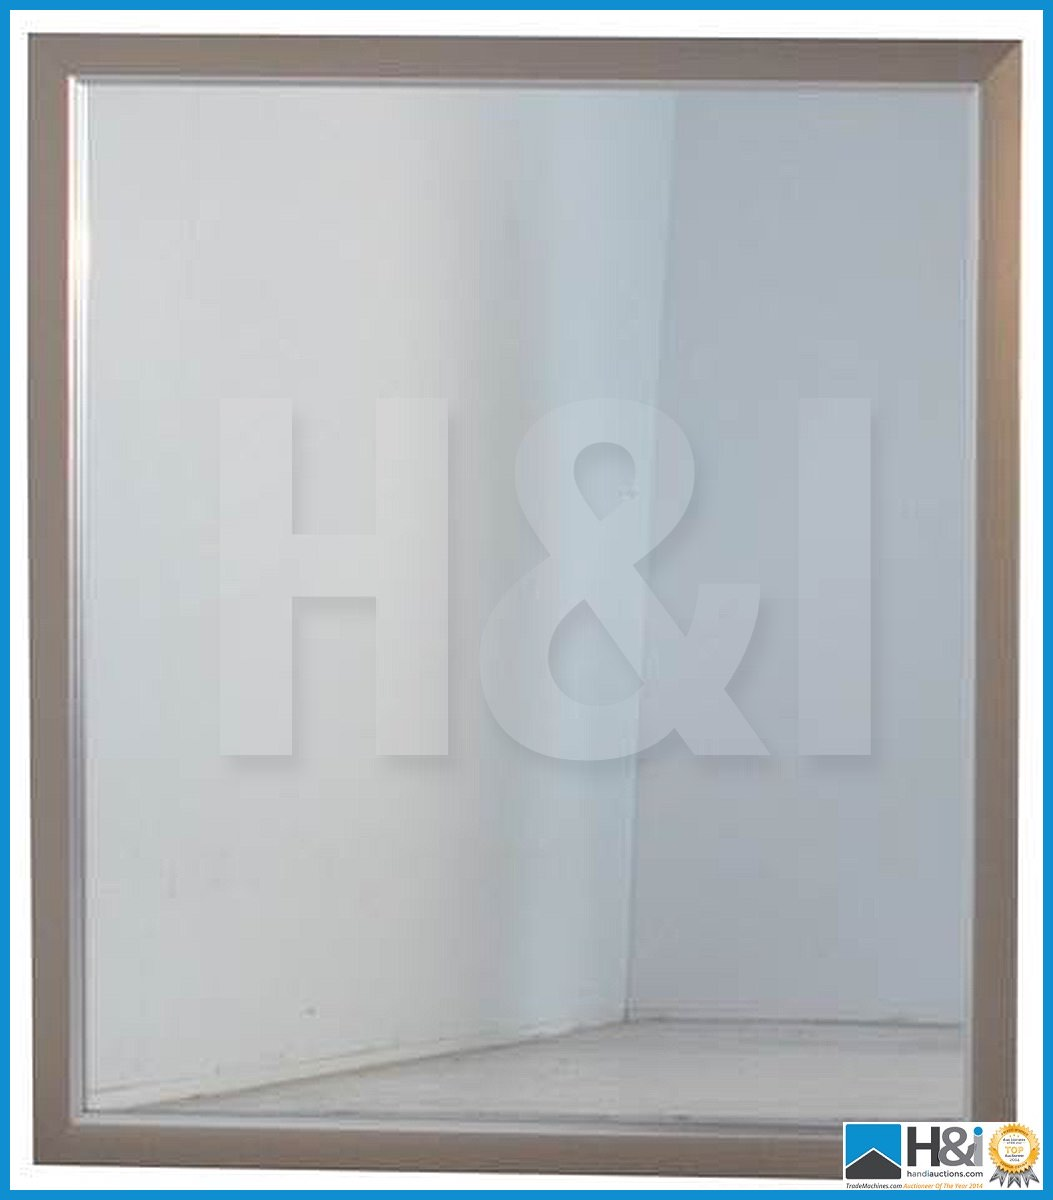 Lot 20 - Stunning black walnut bedroom furniture set comprising: 2-door wardrobe - H 193cm x W 110cm